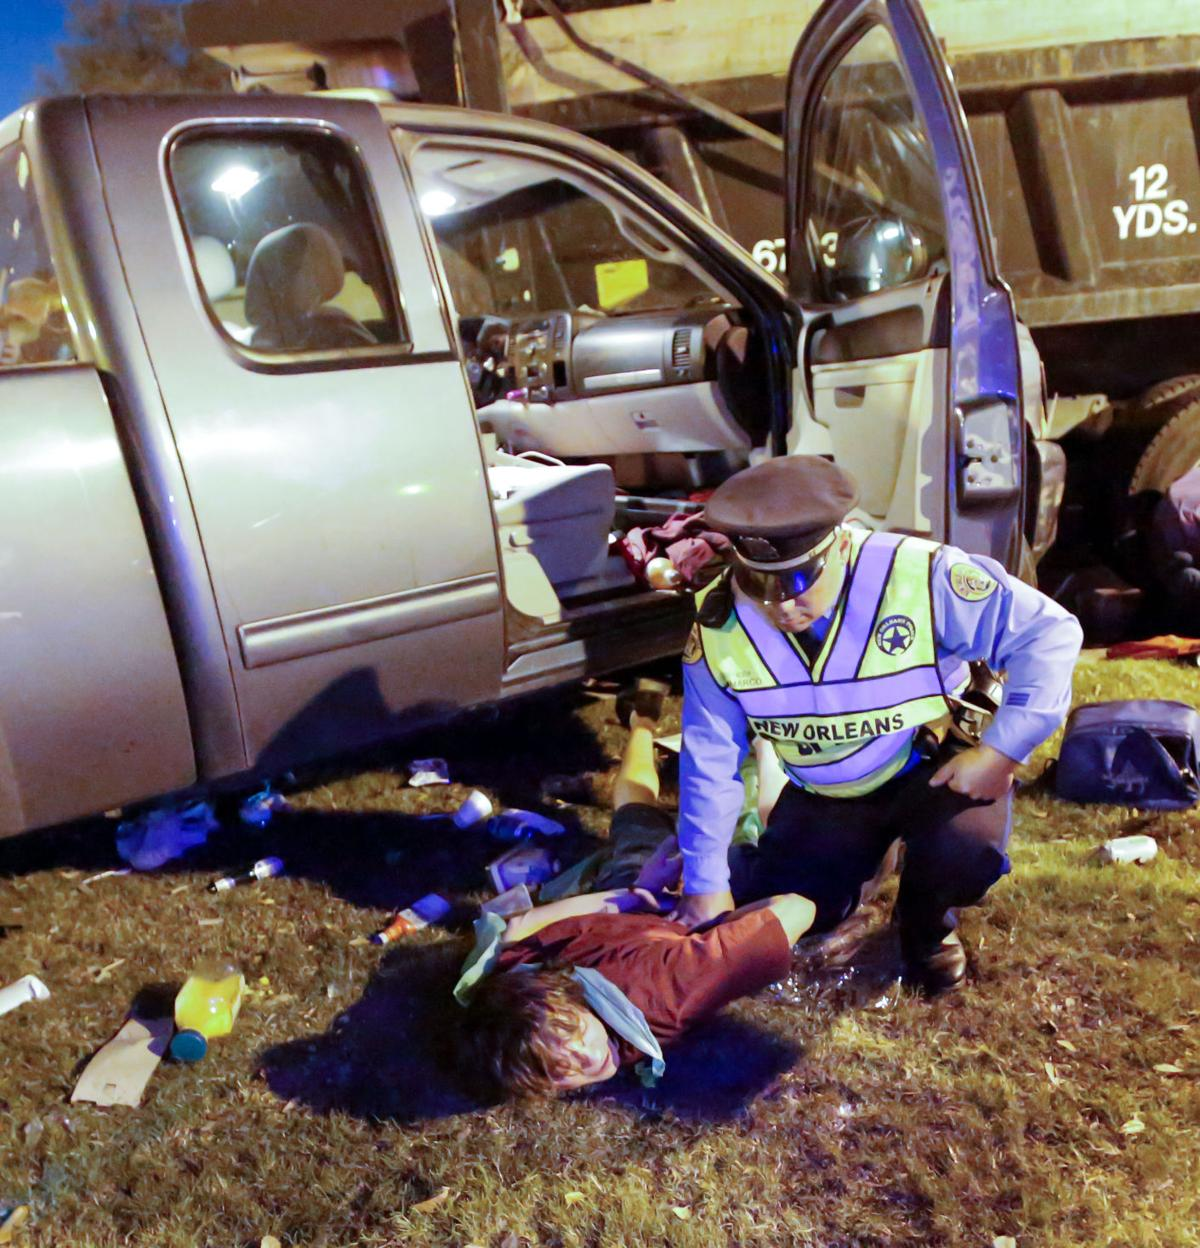 'Horrific' Endymion Crash: 28 Hurt; Injuries Not Life